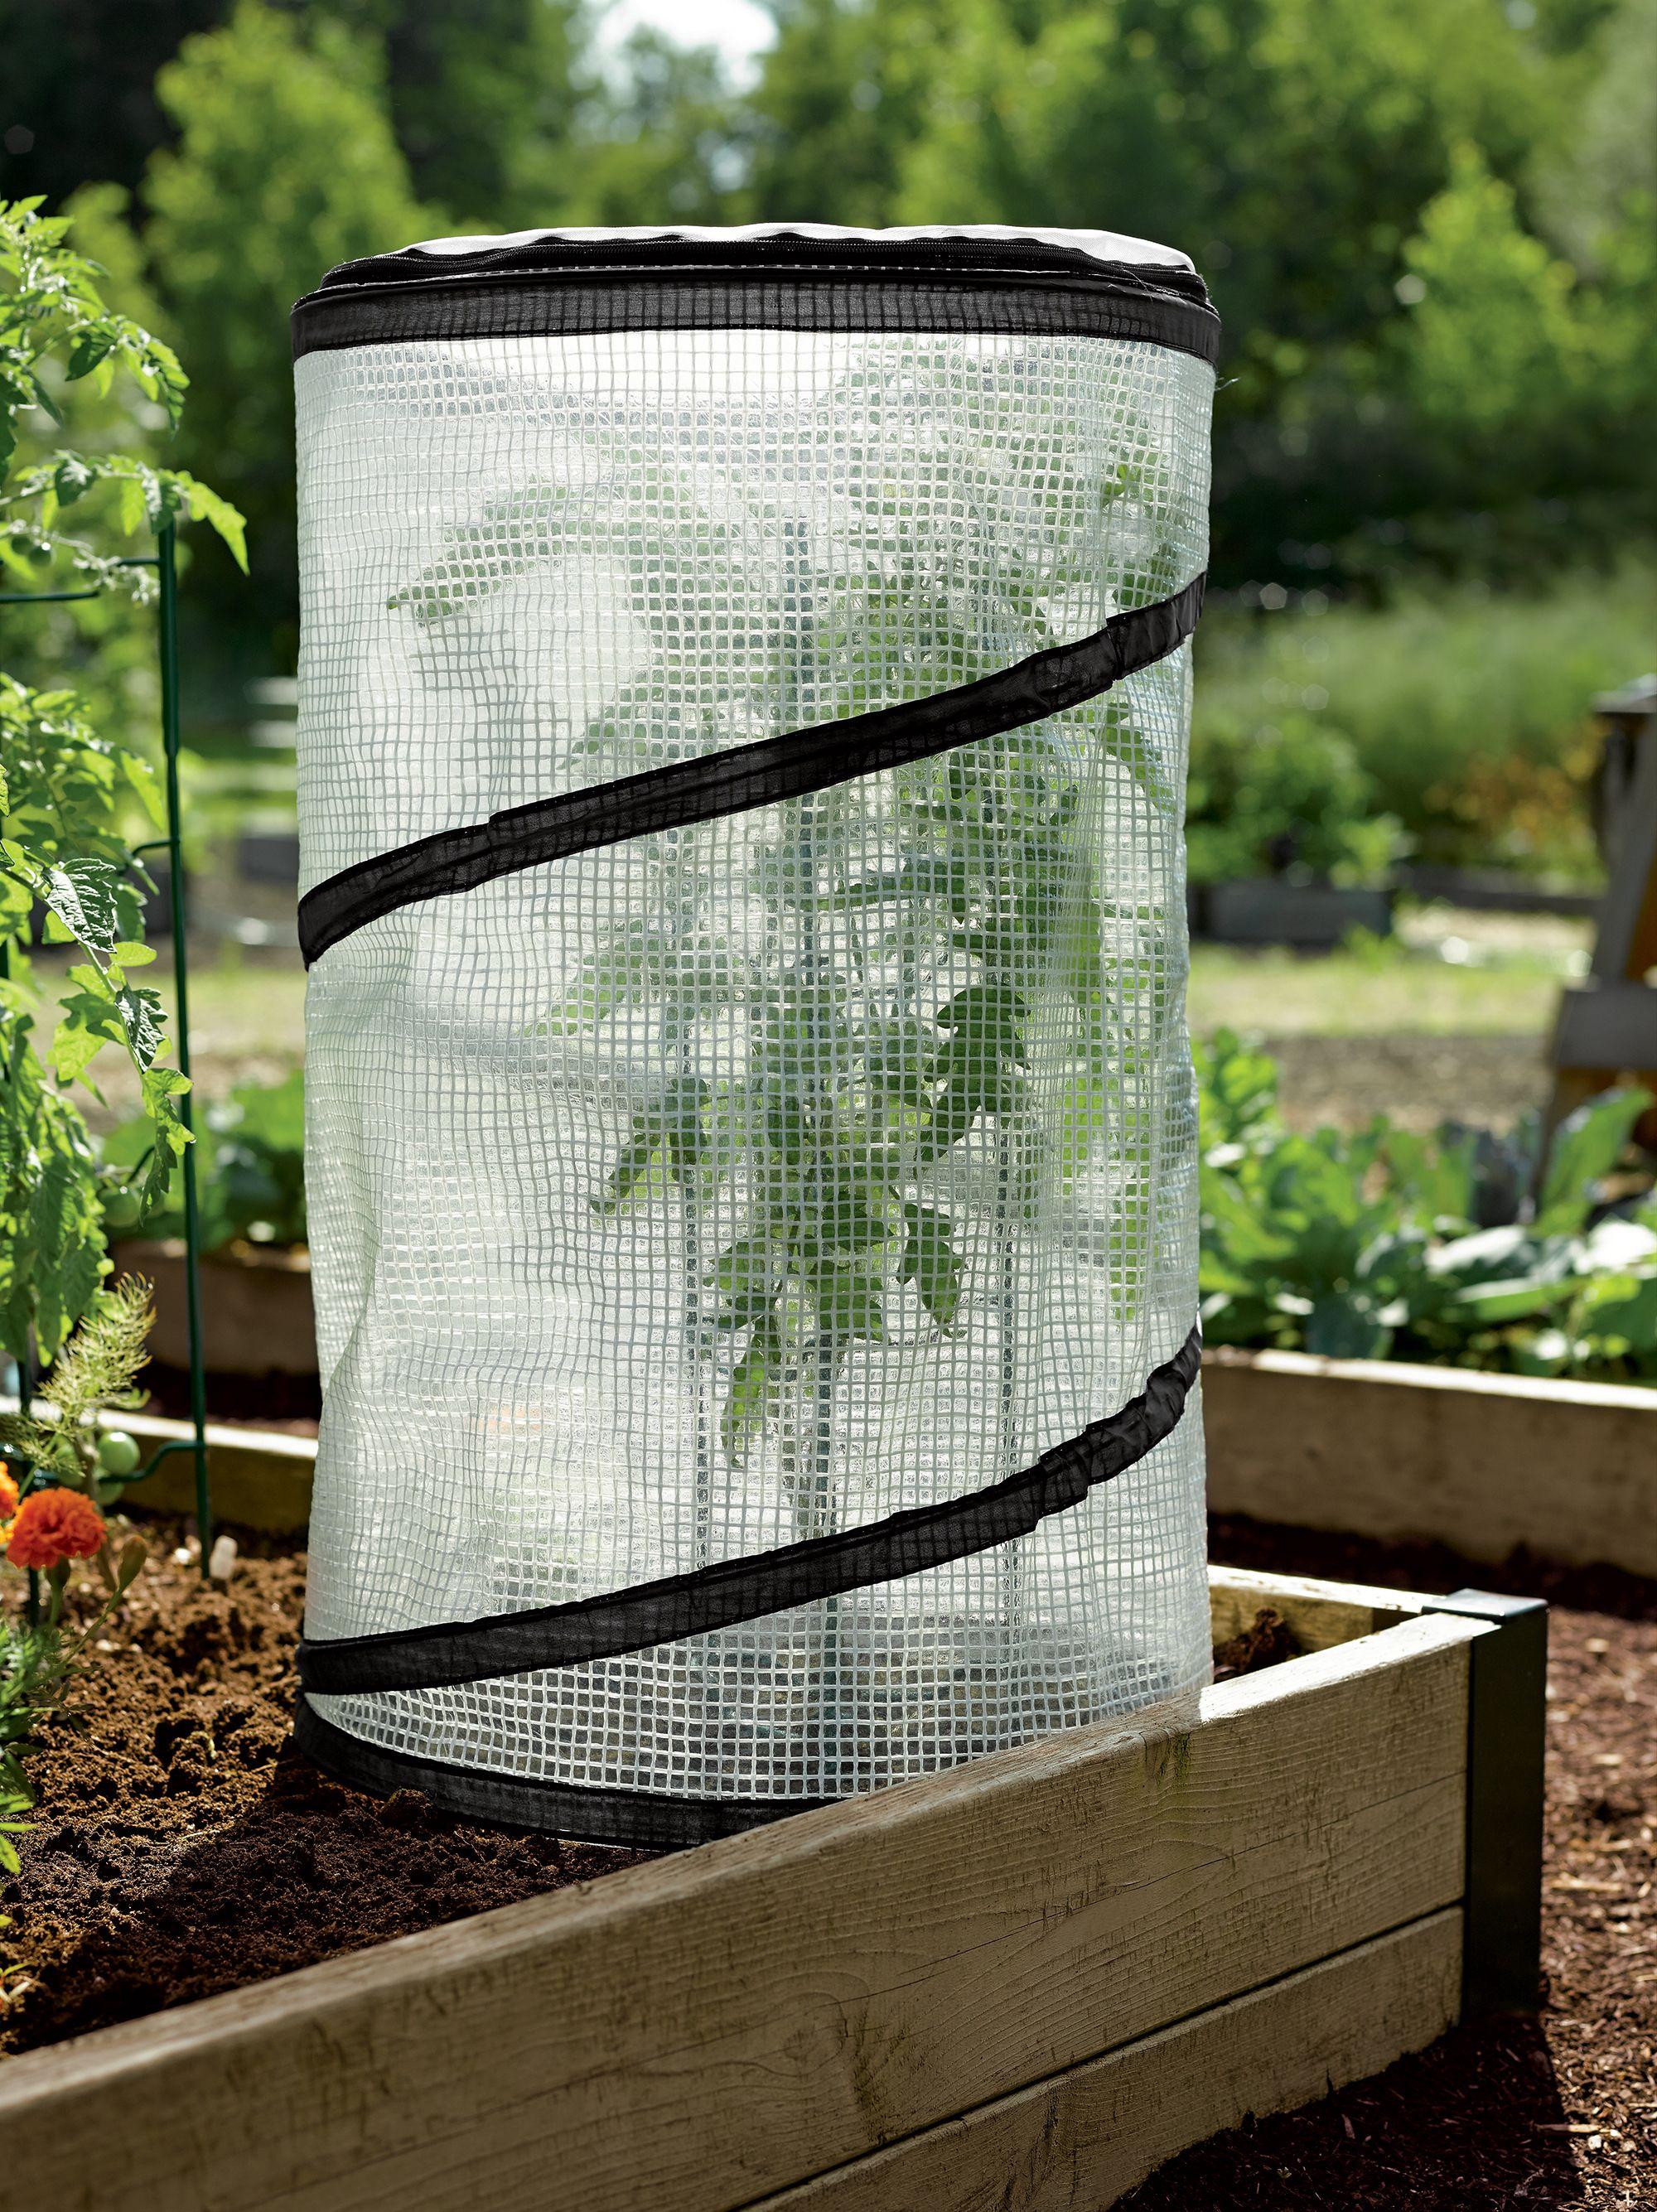 Gardenquilt Floating Row Cover Fabric Gardener S Supply Mini